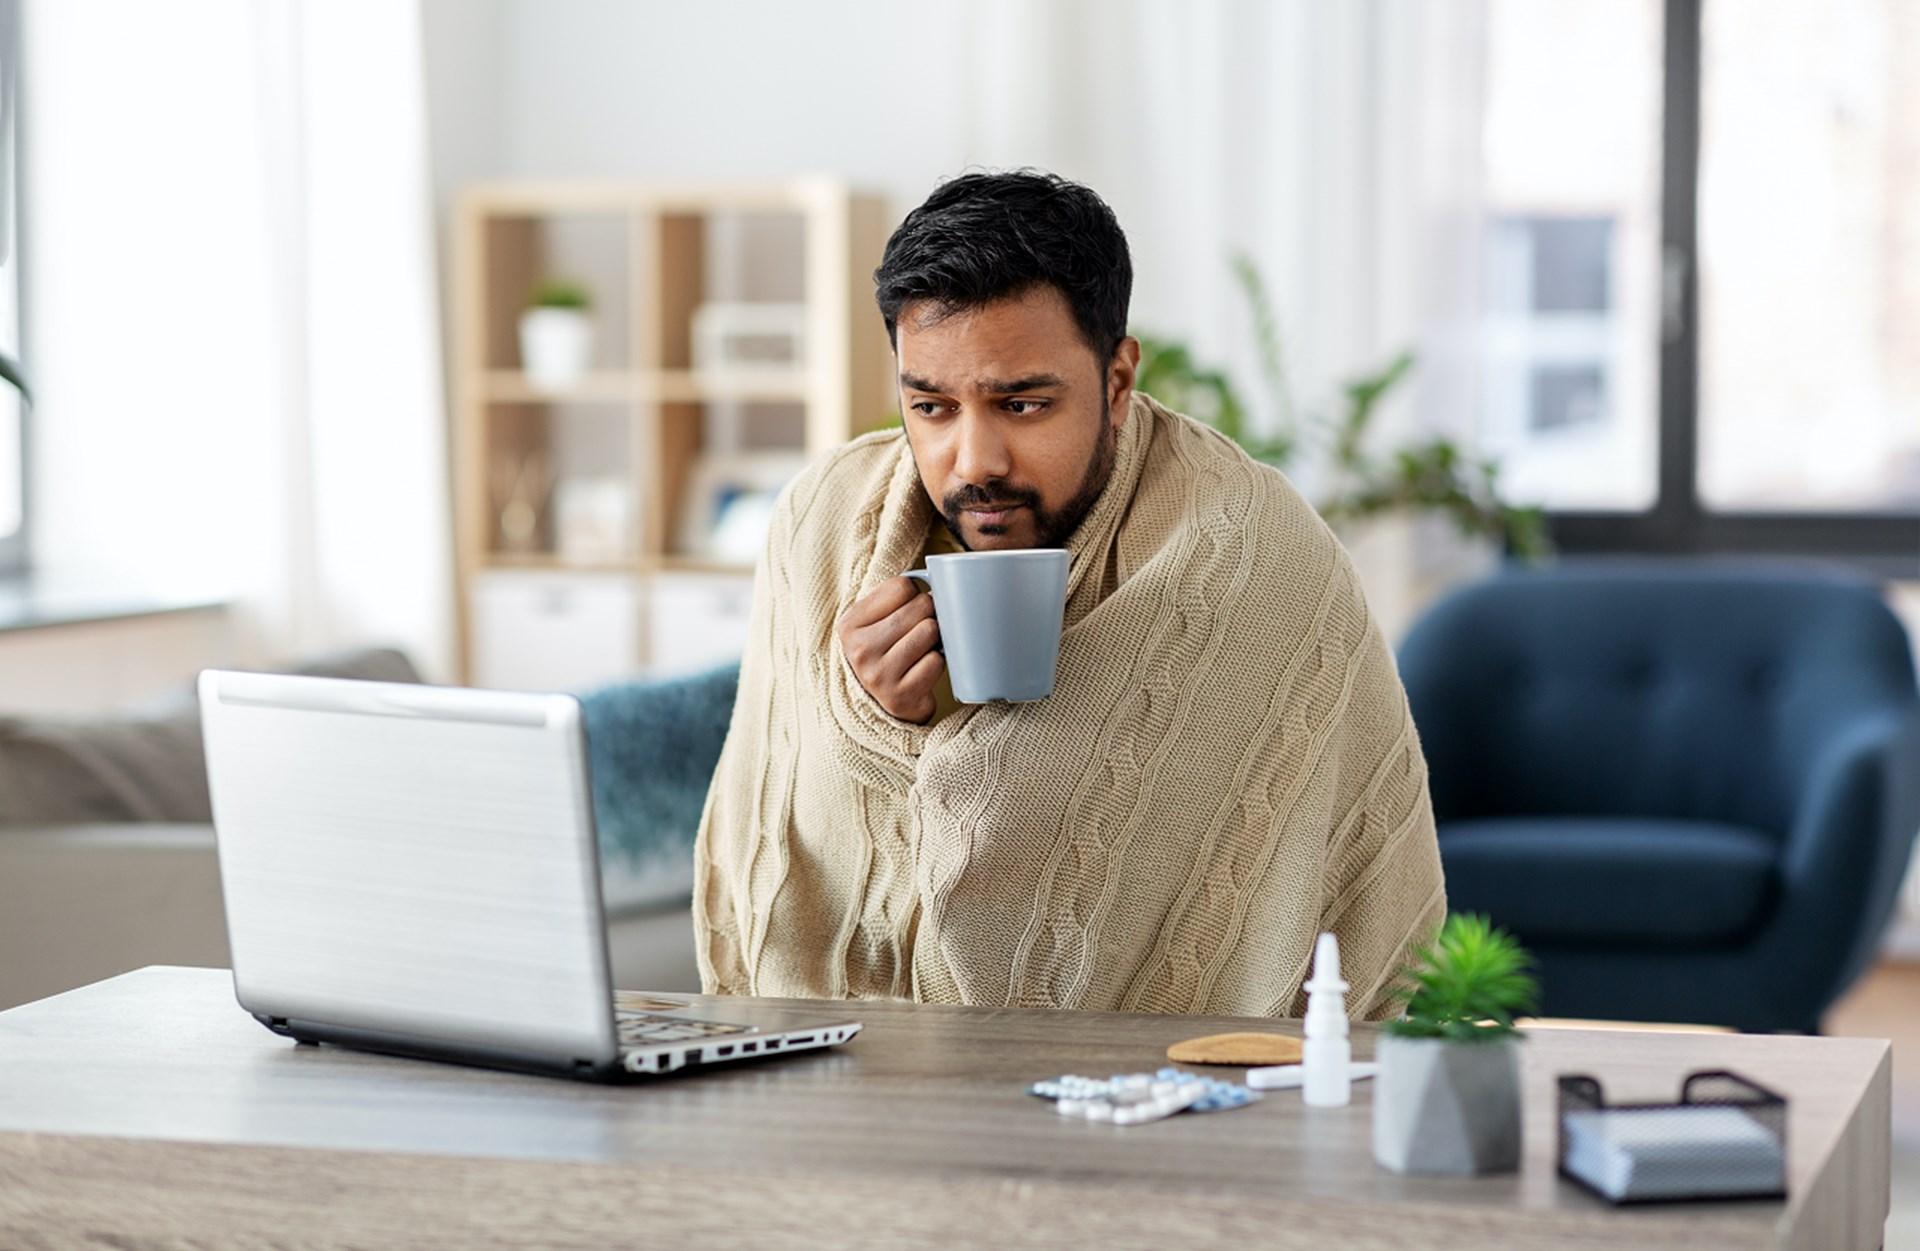 Employee Self Servicel image